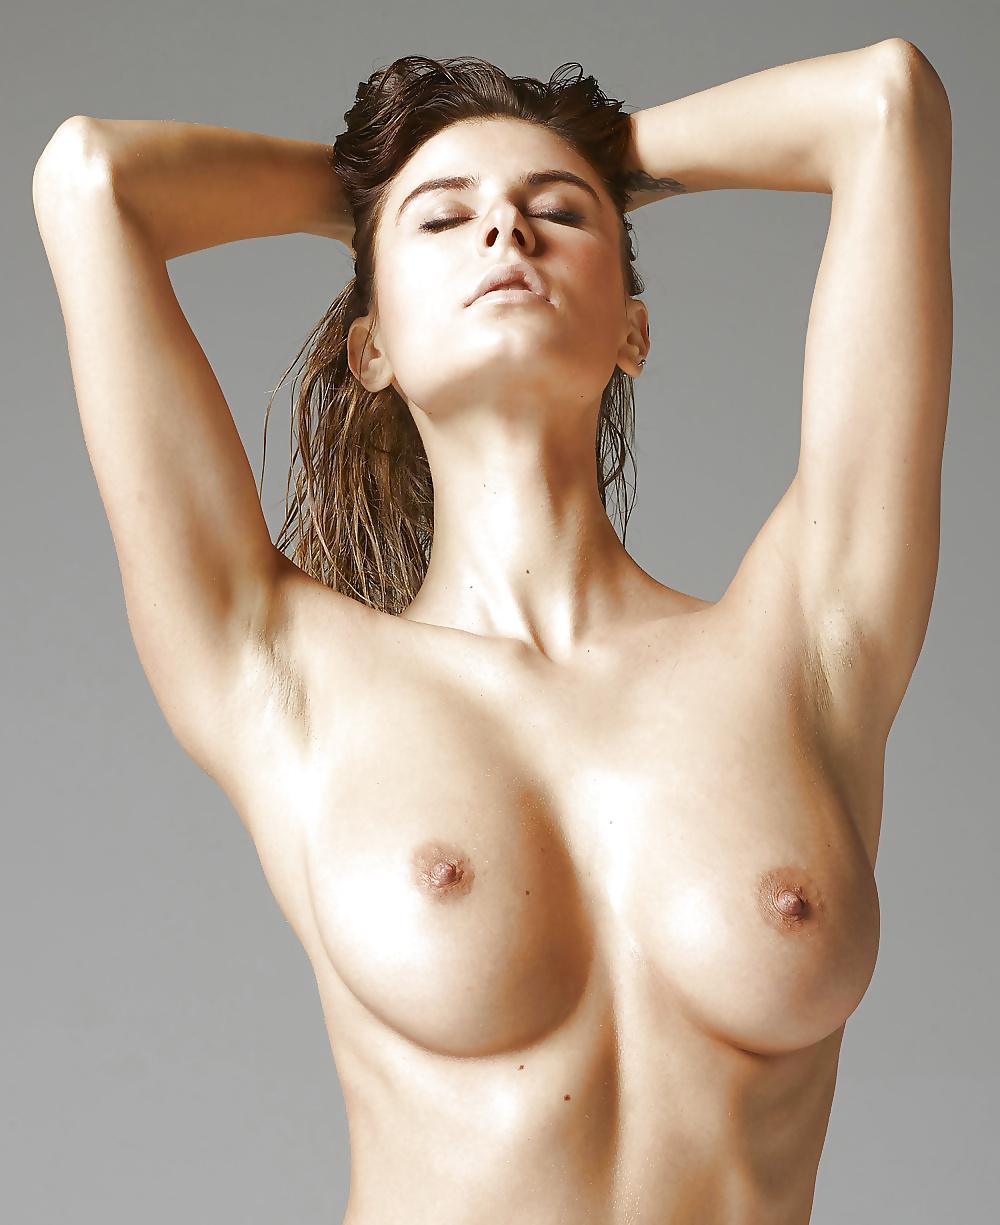 Girl hairy sweaty armpits